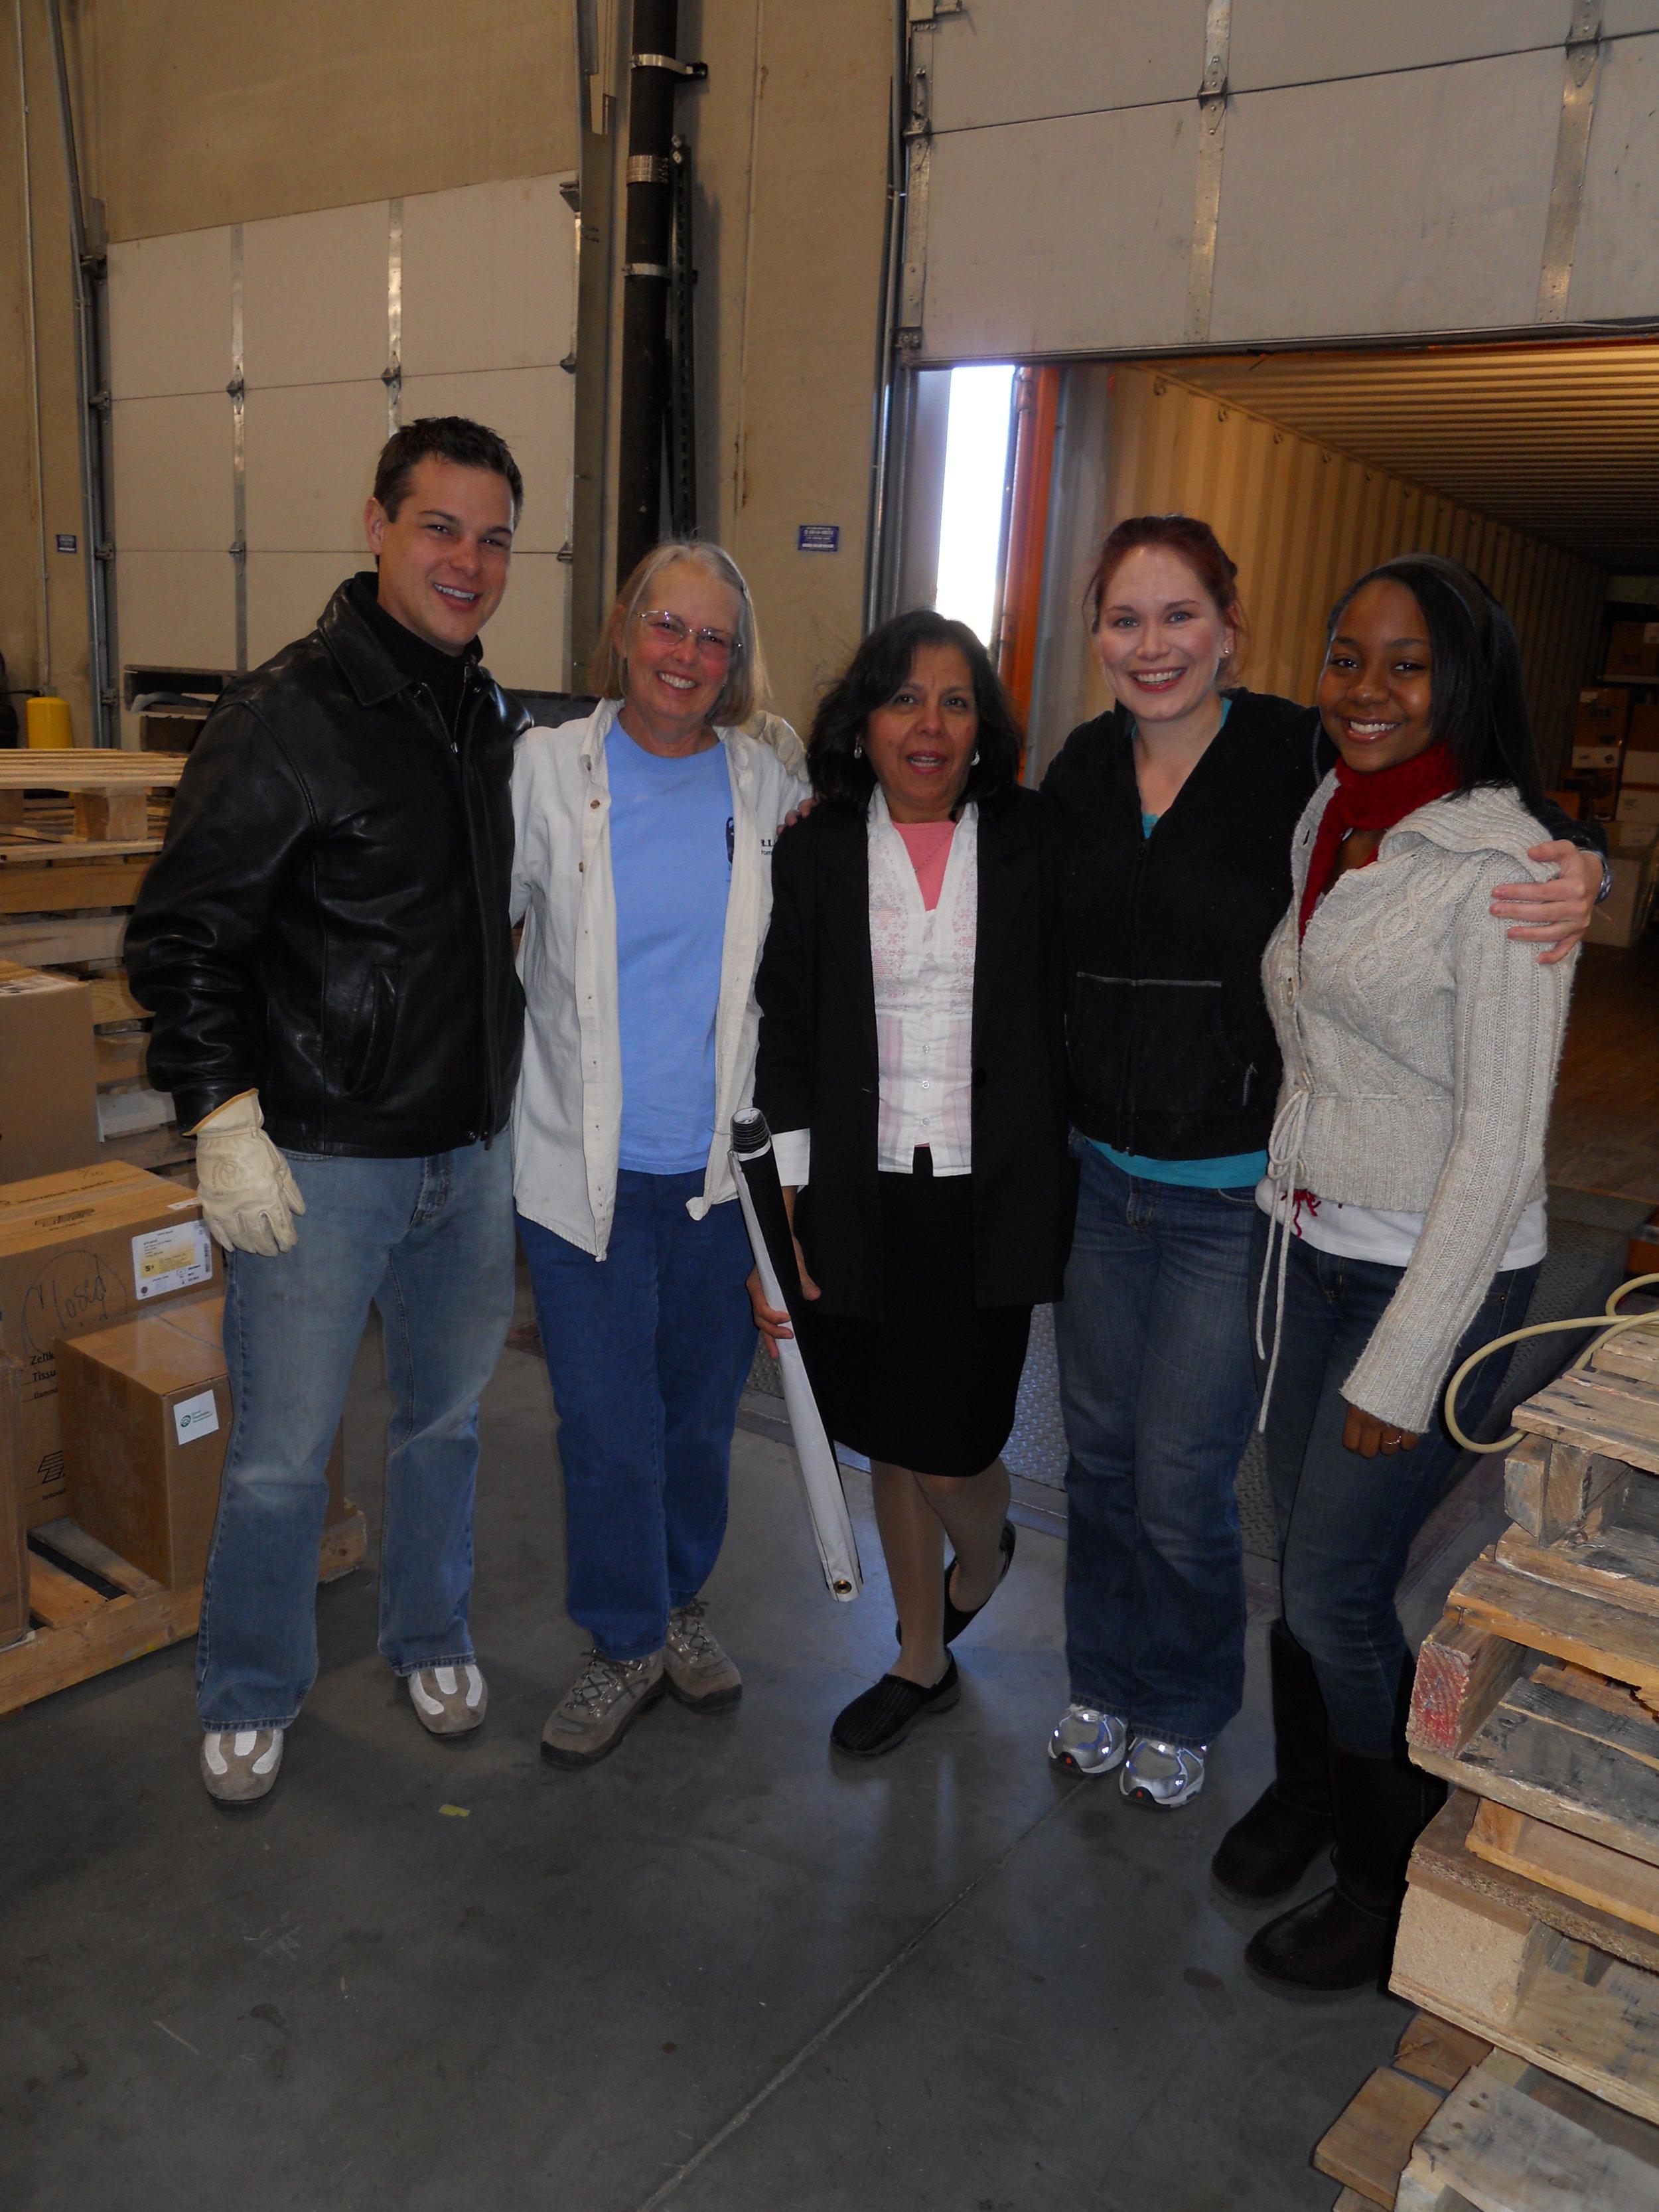 Felisa with Project C.U.R.E. staff and volunteers